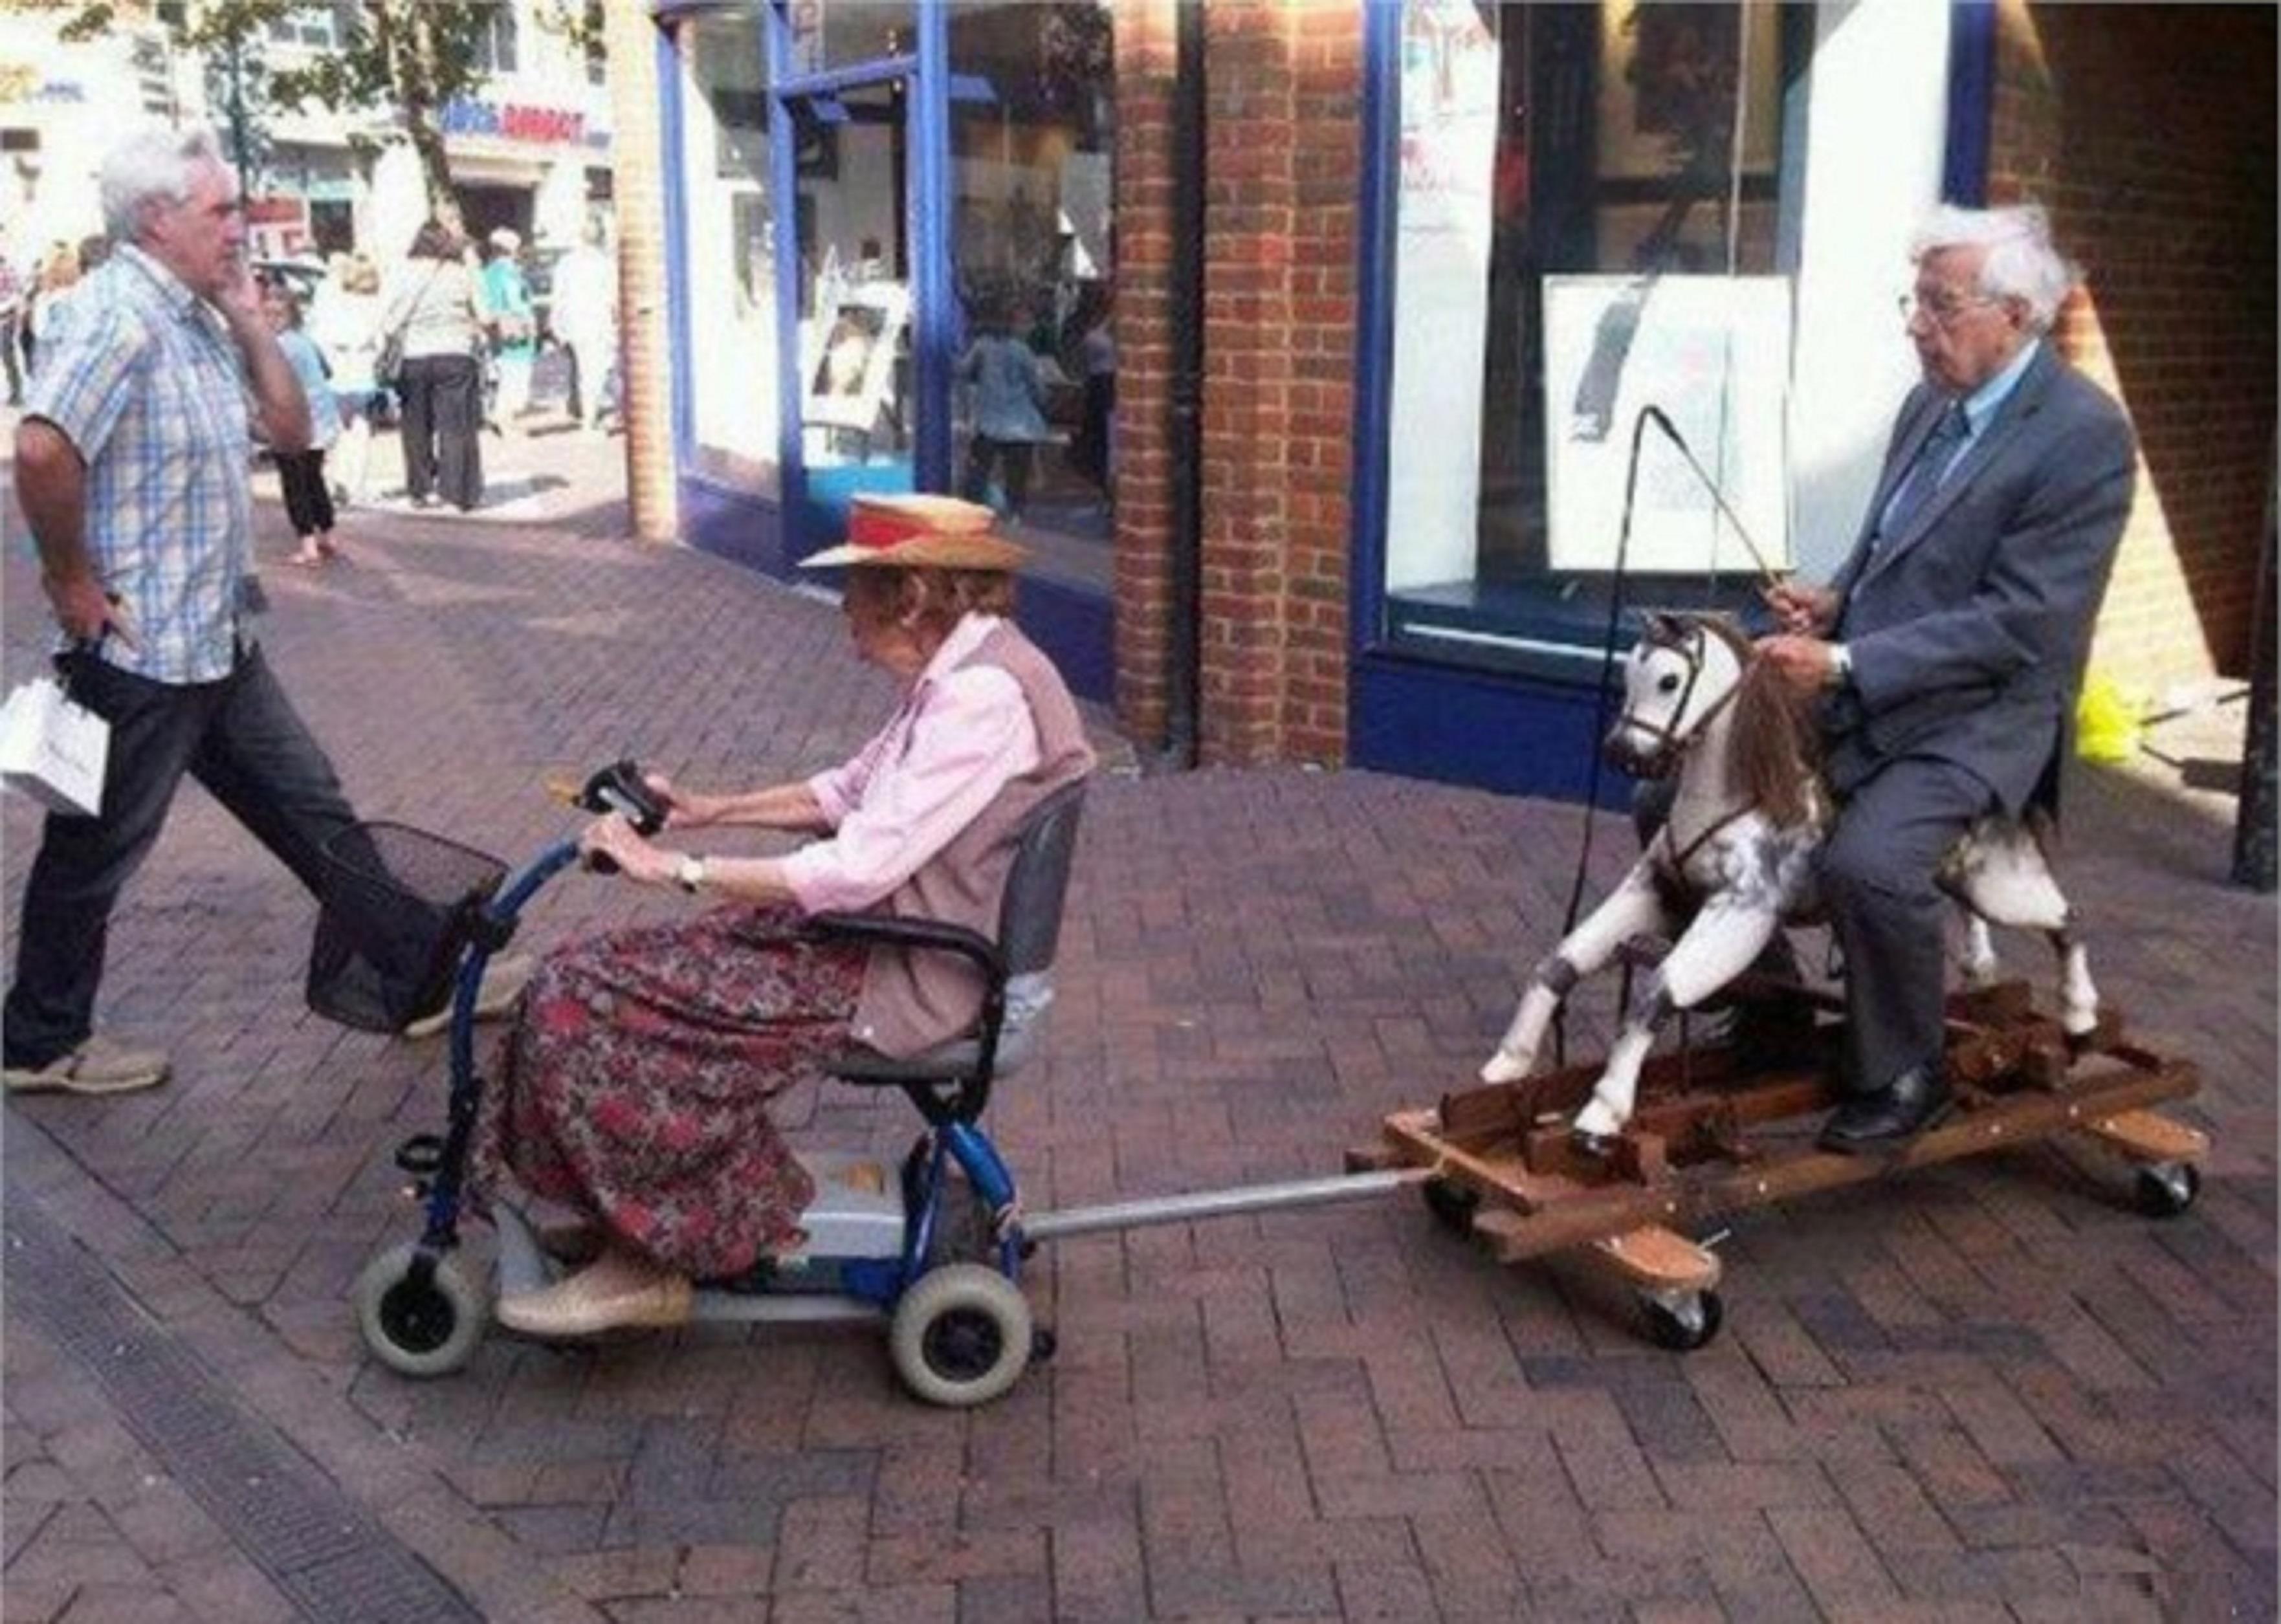 Forumaši u starosti - Page 2 Funny-old-people-old-woman-on--1408